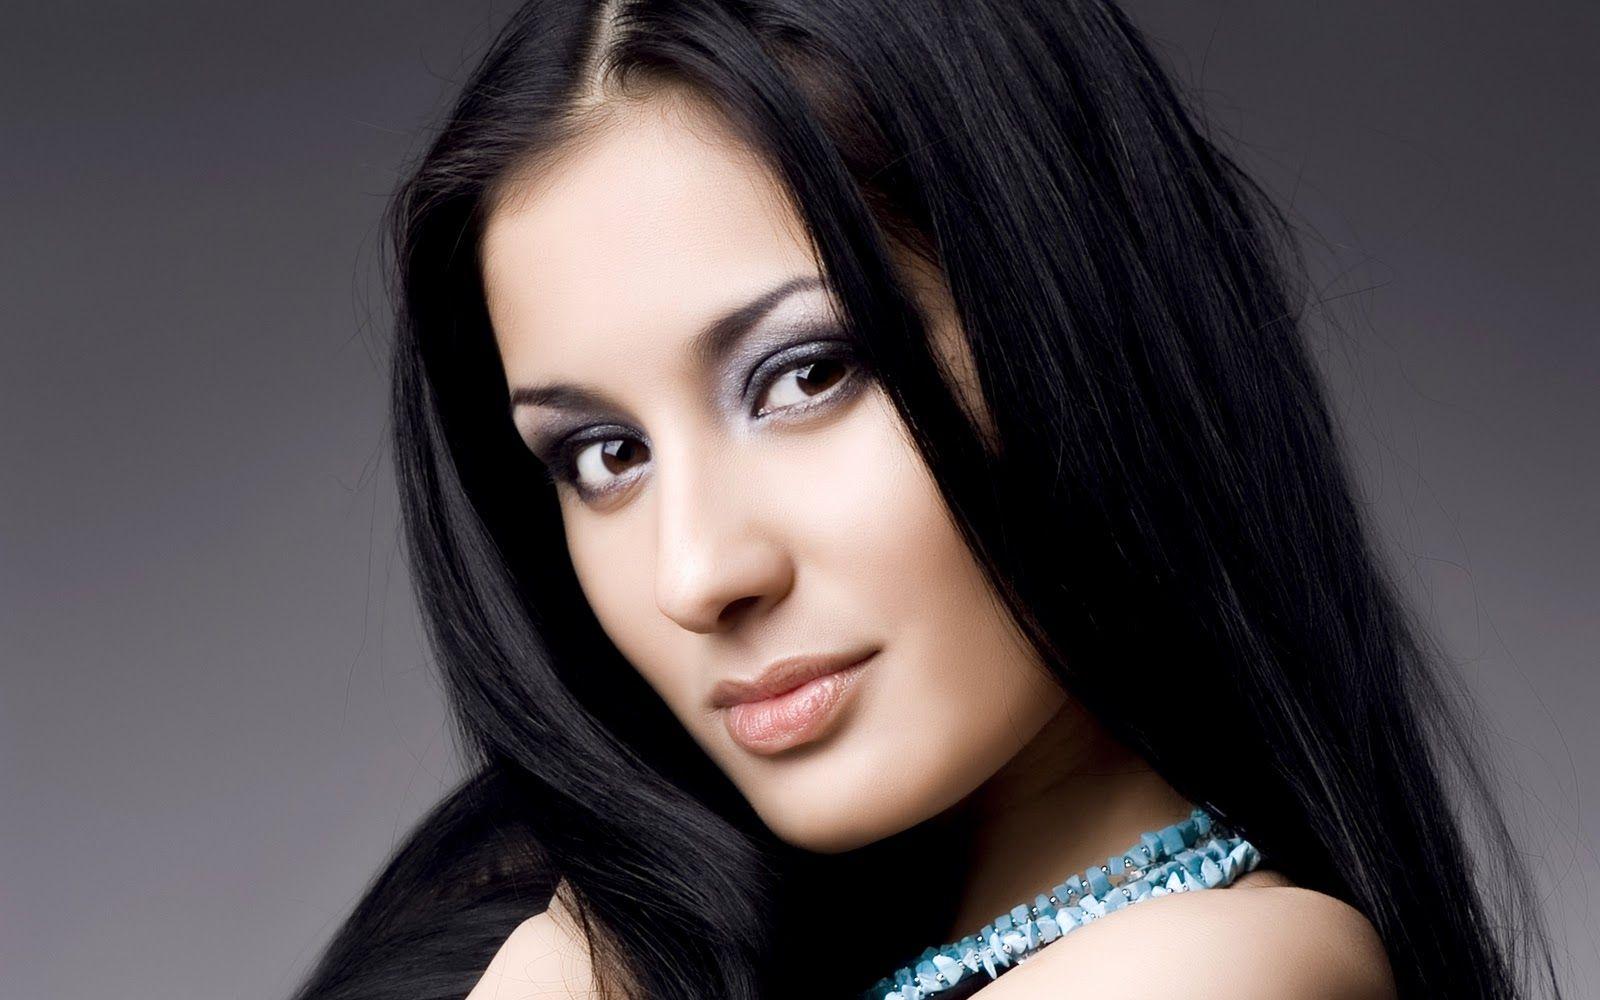 Beautiful Face Wallpaper Beautiful Face Wallpaper Images Pictures Most Beautiful Face Beautiful Face Beautiful Women Faces Indian Makeup And Beauty Blog